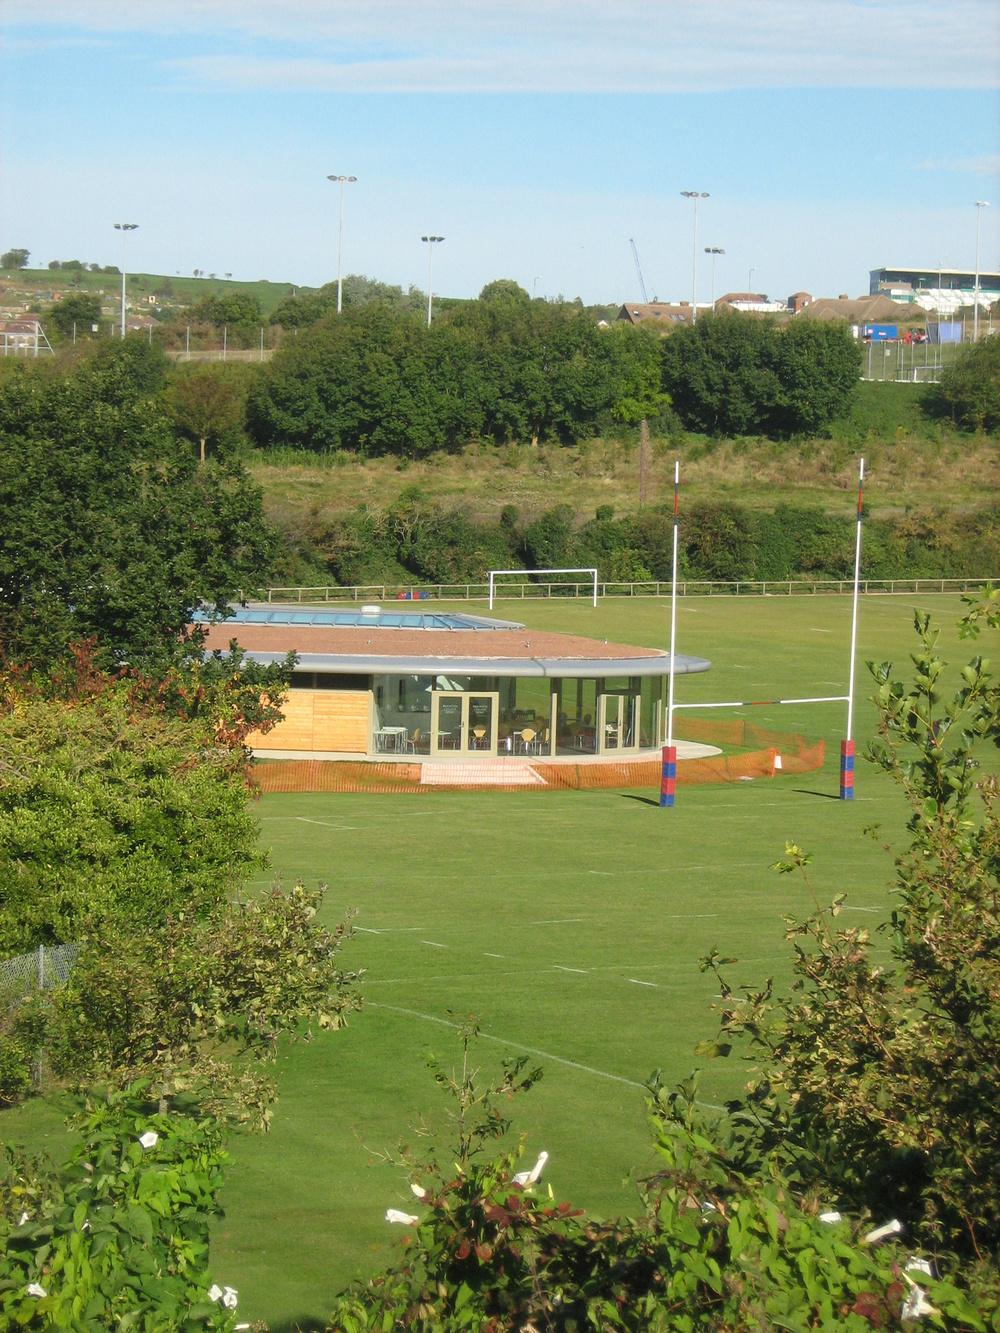 brighton-sports-pavilion-4.jpg